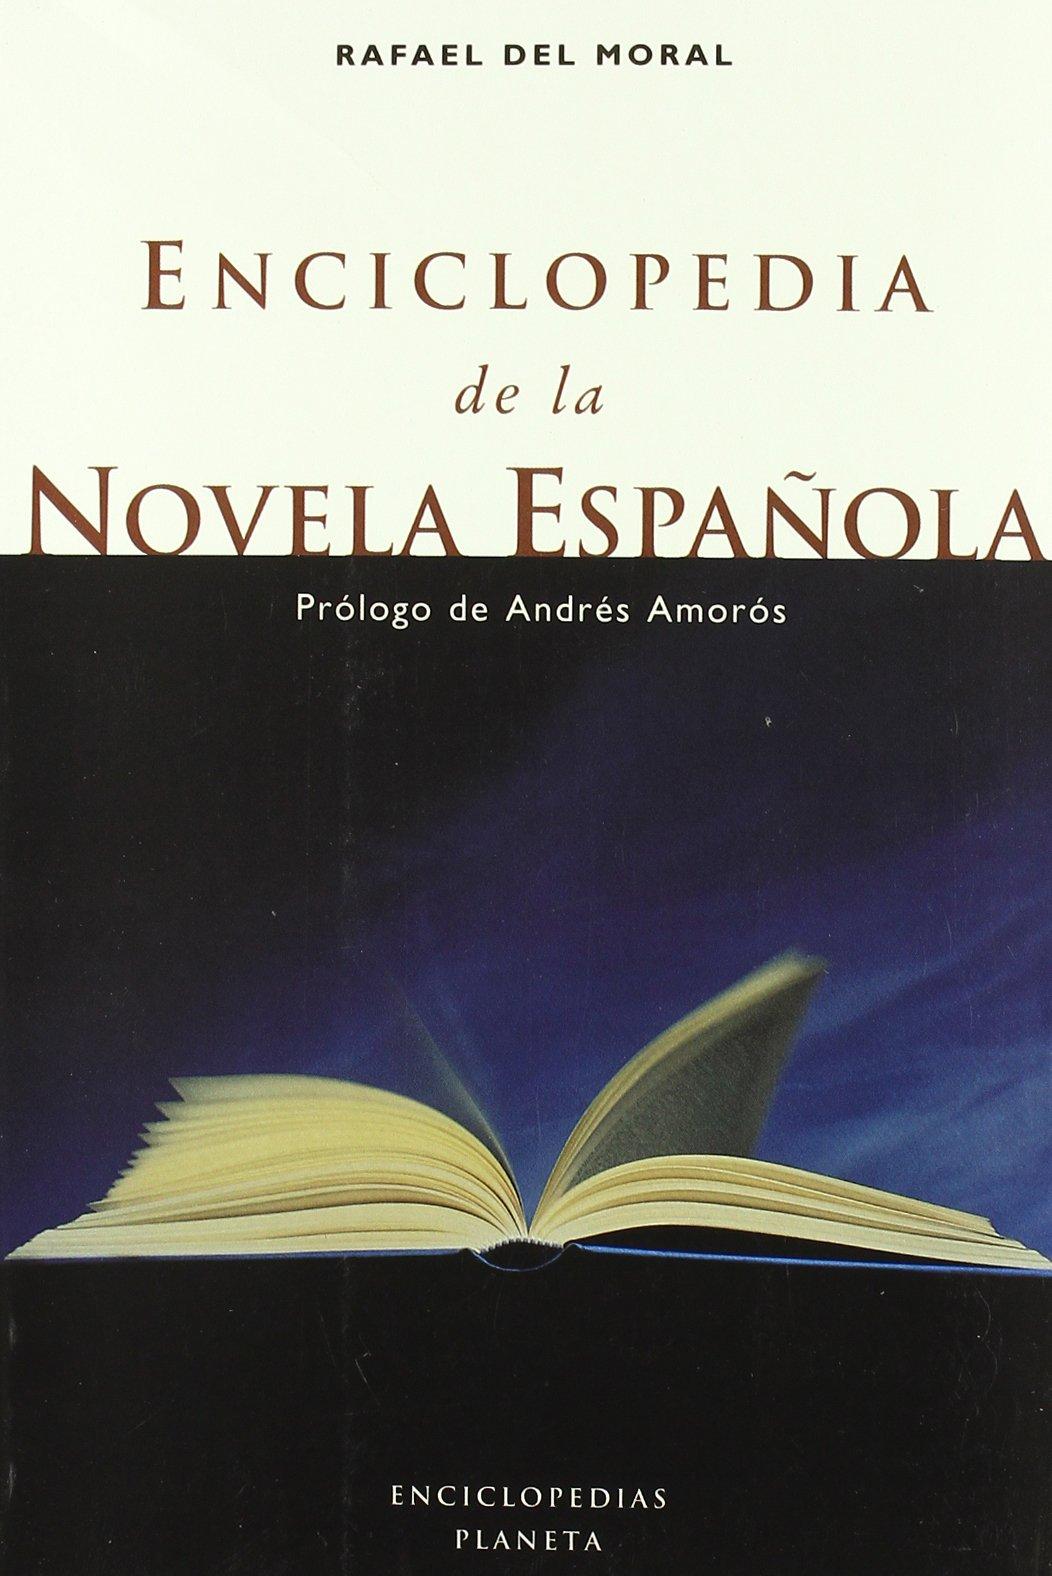 Enciclopedia de la novela española (8408026666): Amazon.es: Rafael ...